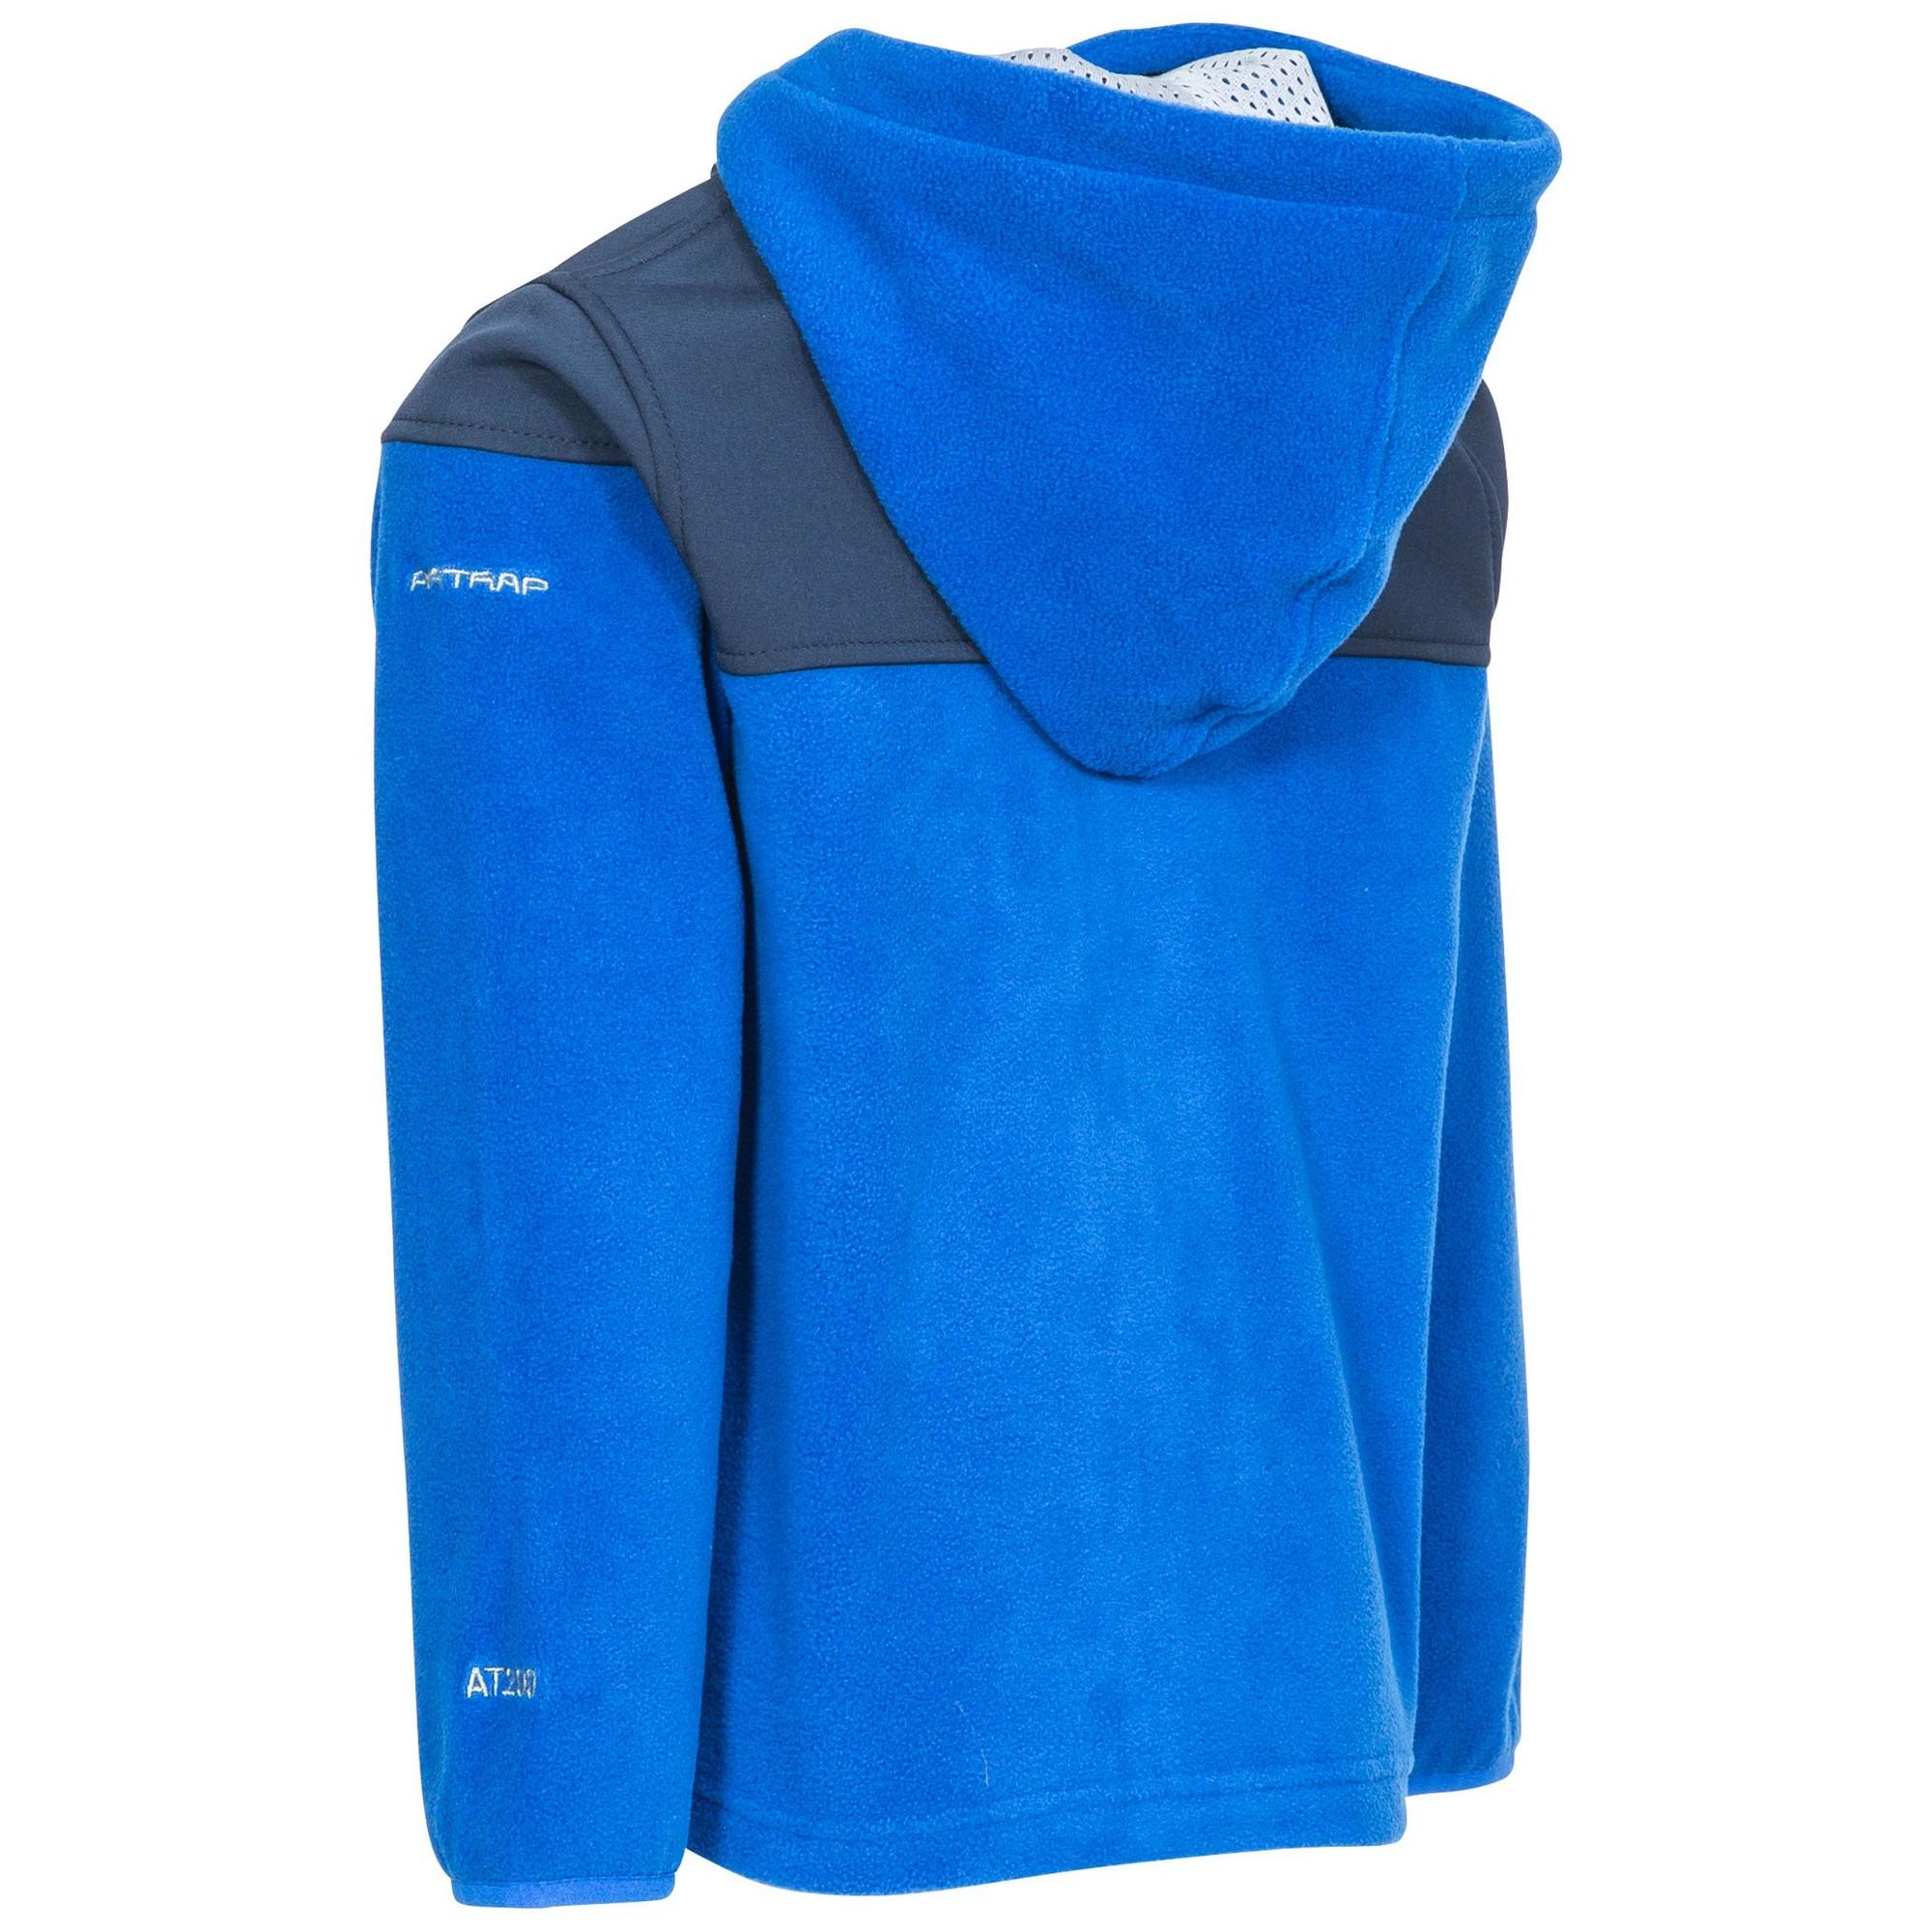 Trespass Boys Bieber Hooded Fleece Jacket (3-4 Years) (Blue)